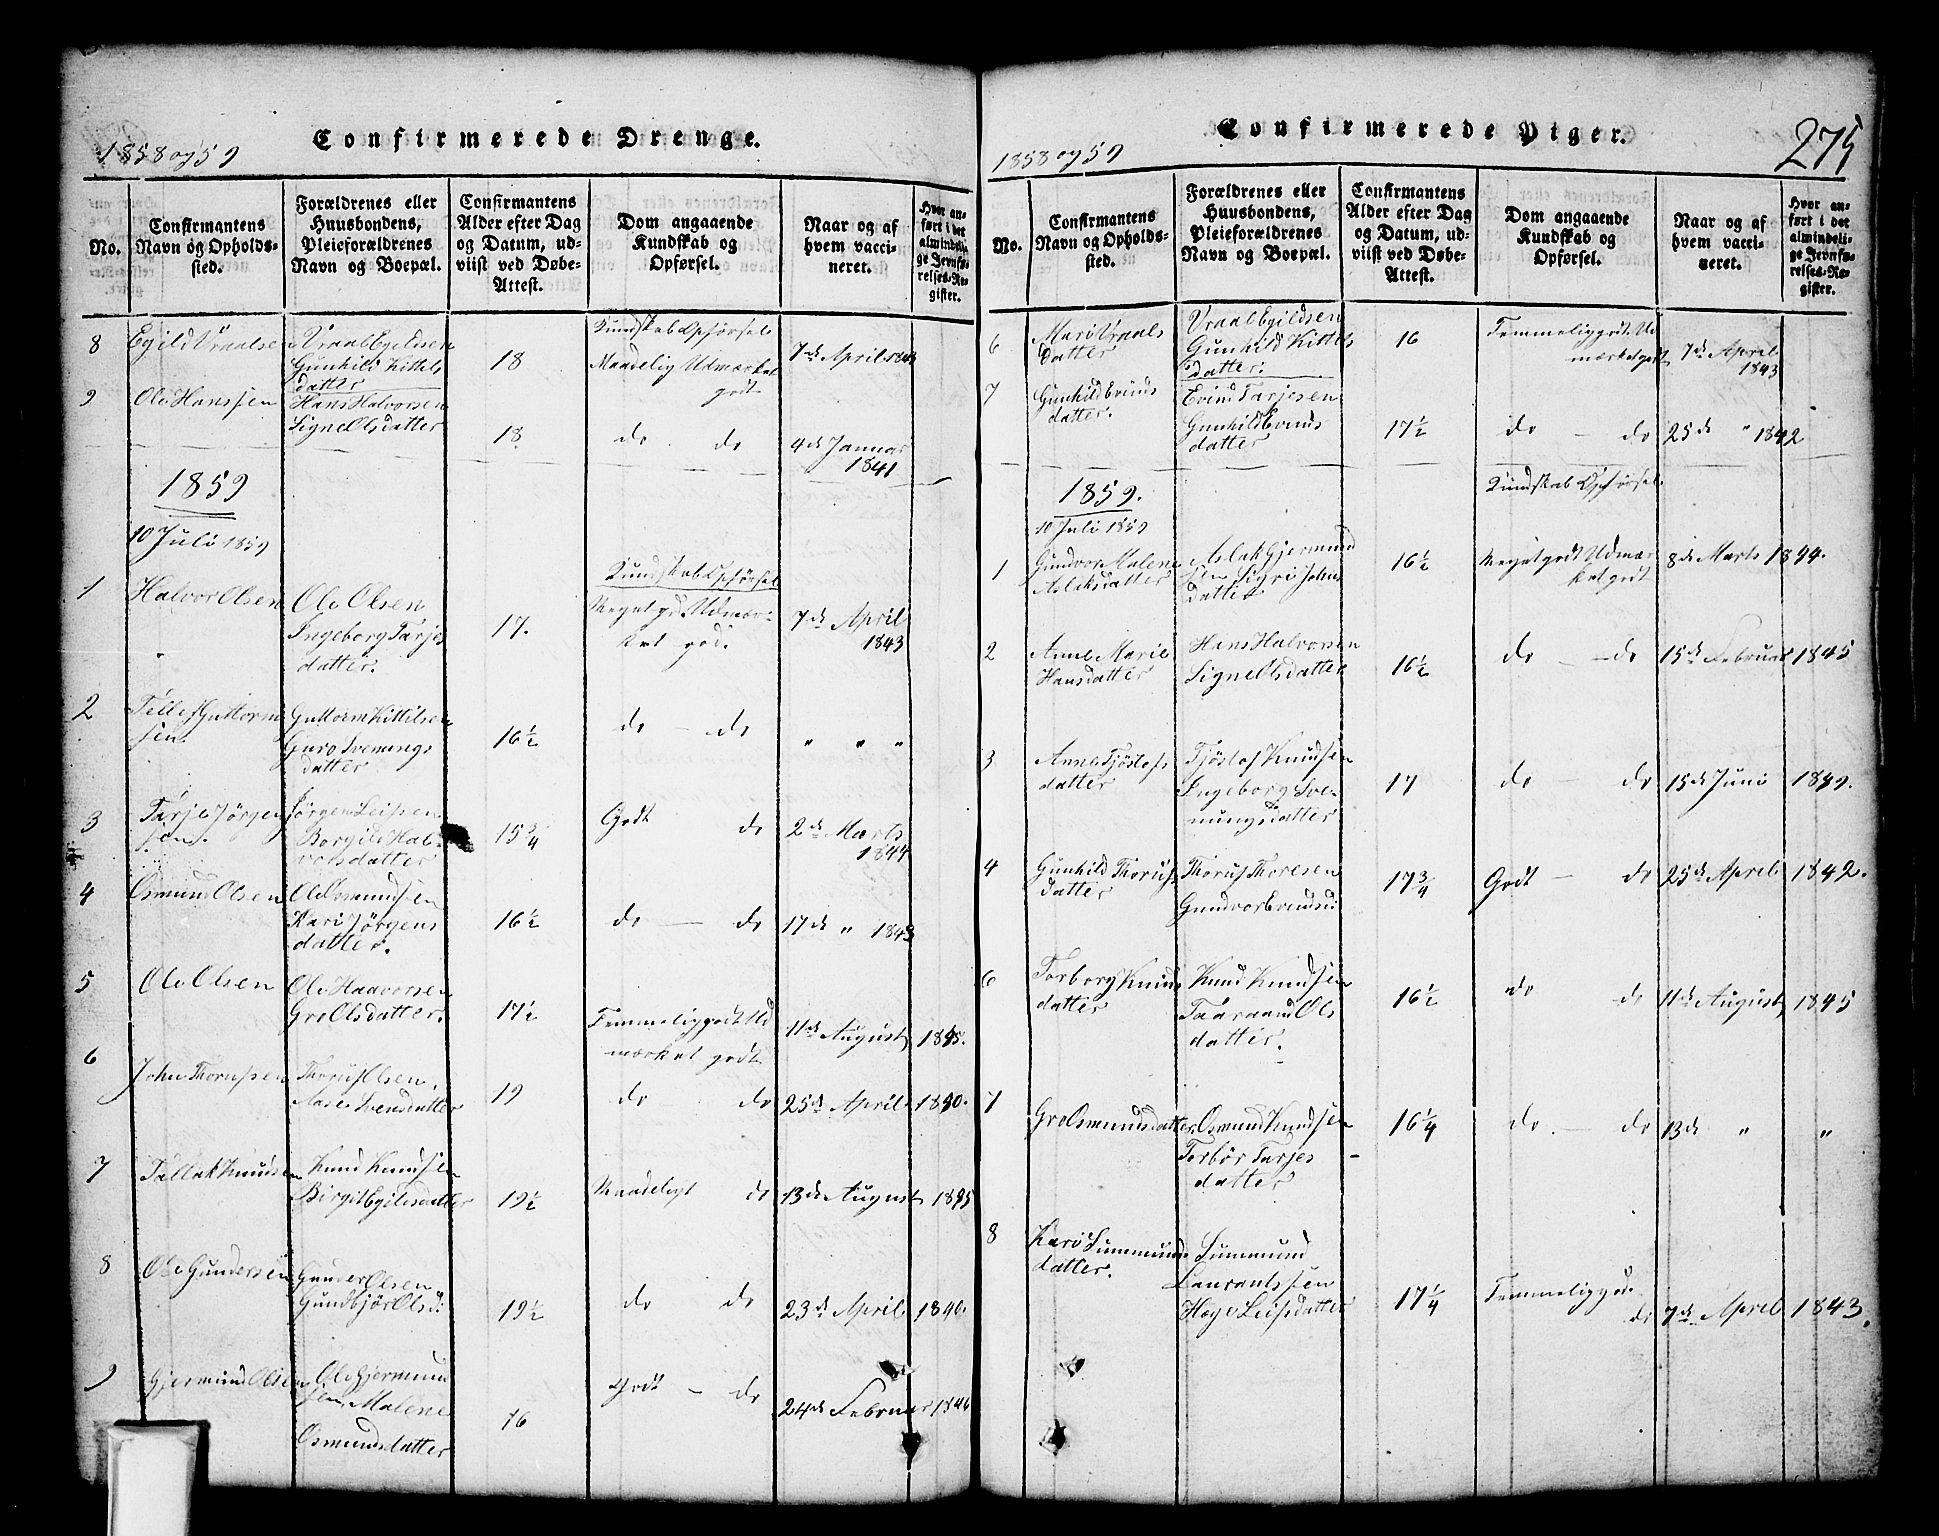 SAKO, Nissedal kirkebøker, G/Gb/L0001: Klokkerbok nr. II 1, 1814-1862, s. 275